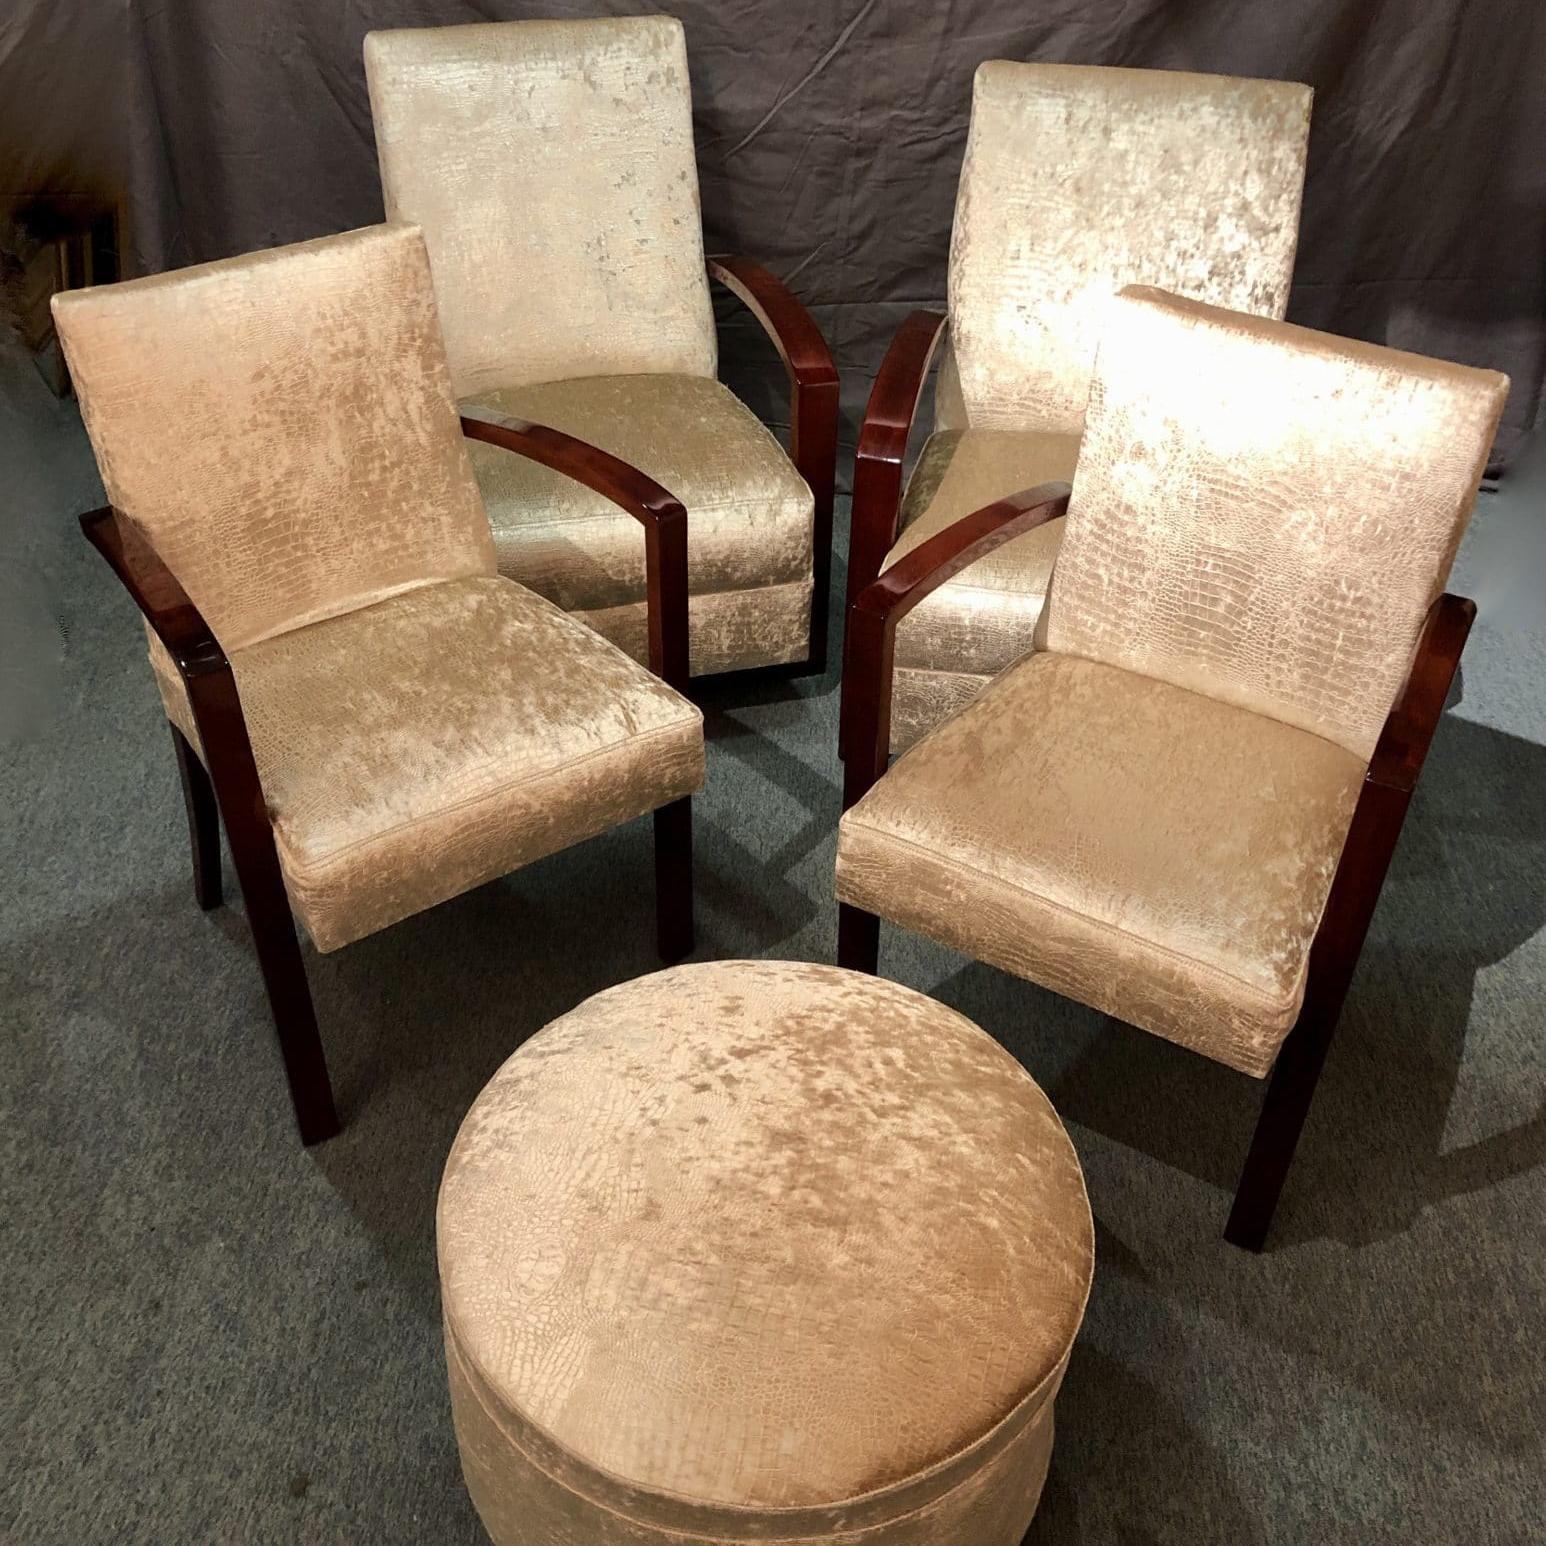 Salon 4 fauteuils et un repose-pied. Mid-Century, circa 1940